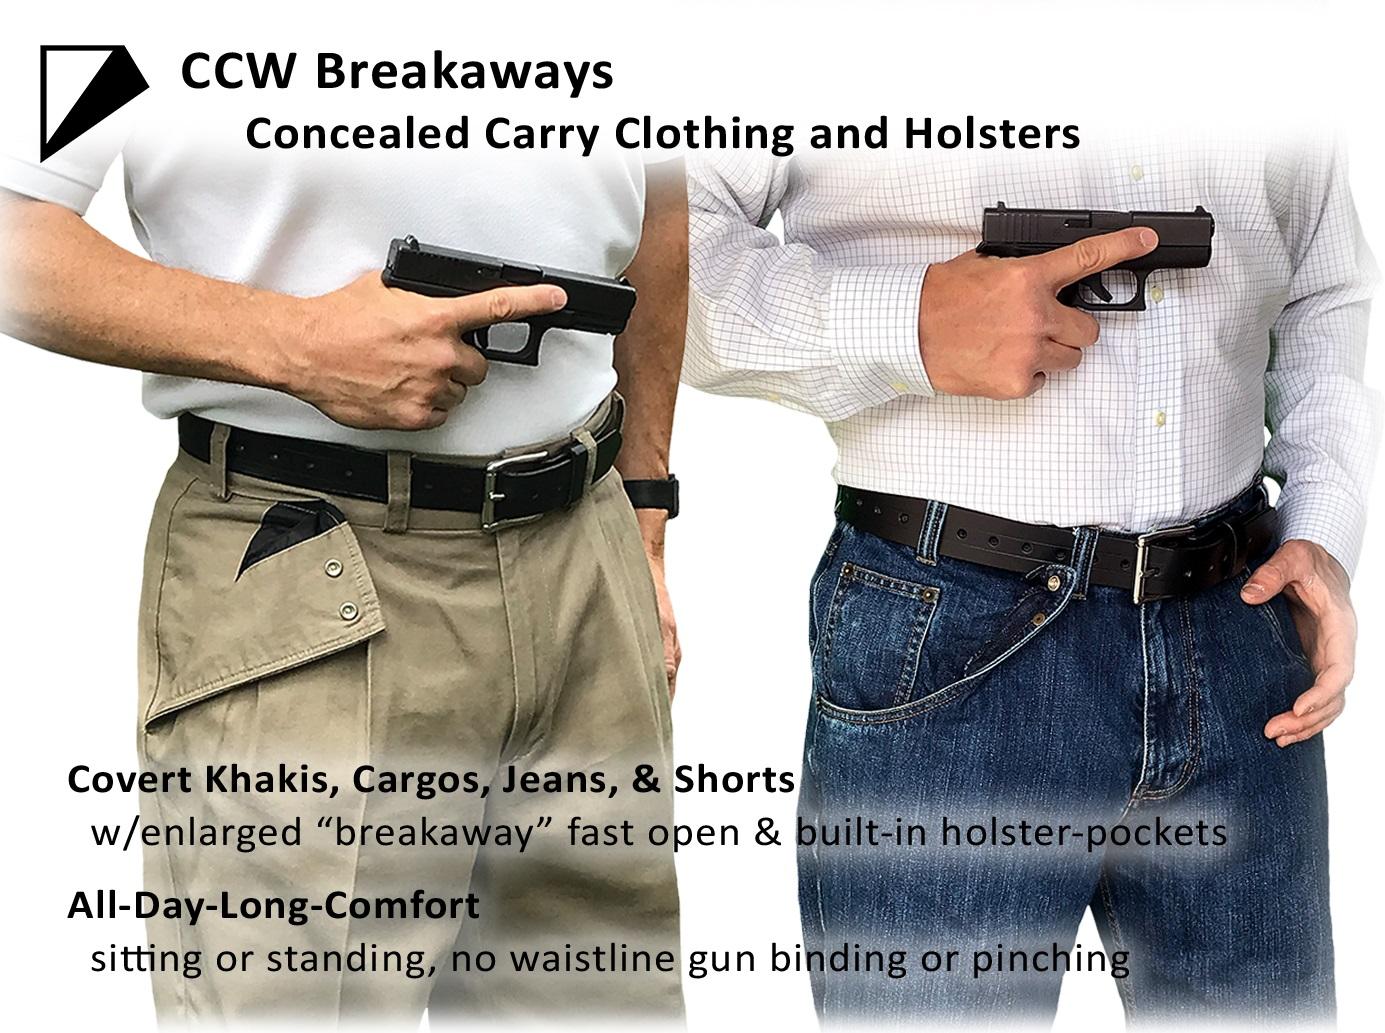 ccw-breakaways-fmg-print-ad-20201008.jpg